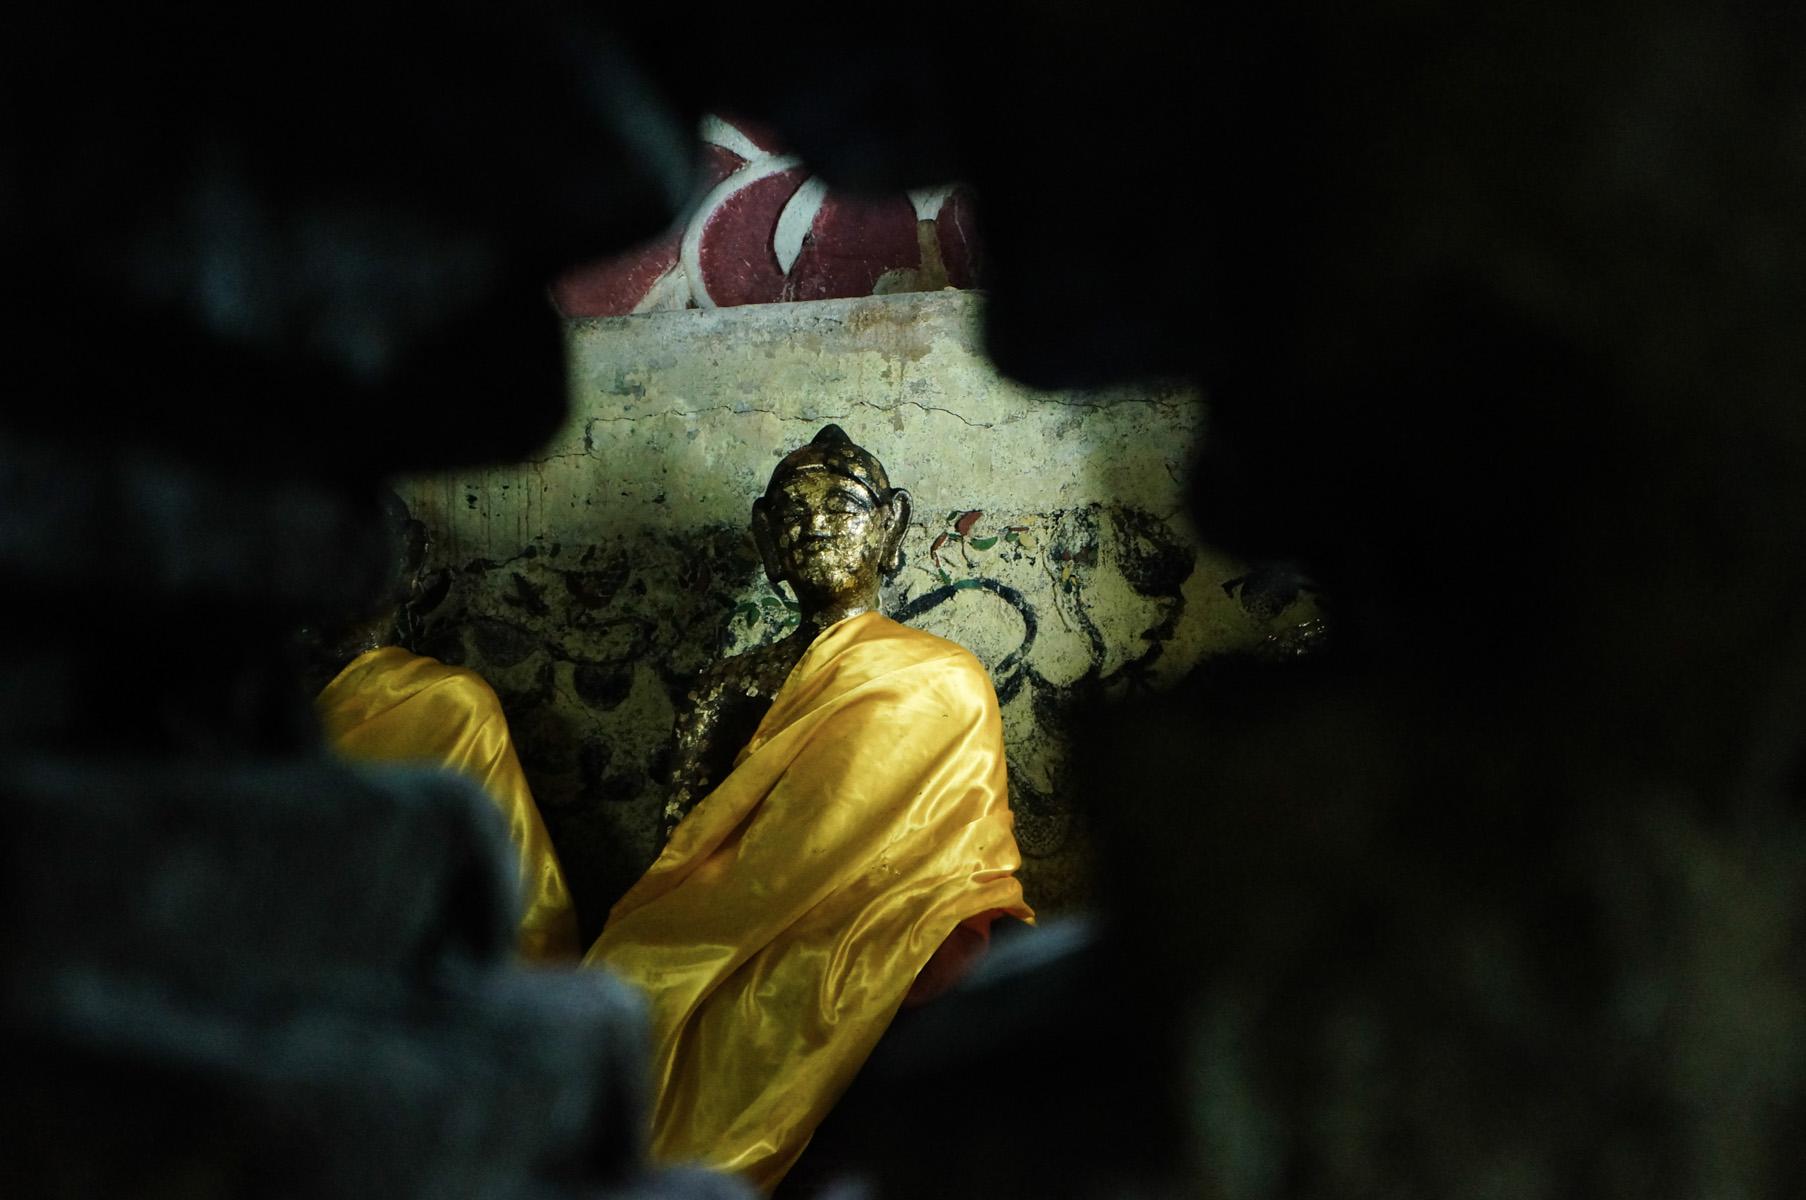 Buddha seen through a port in the wall